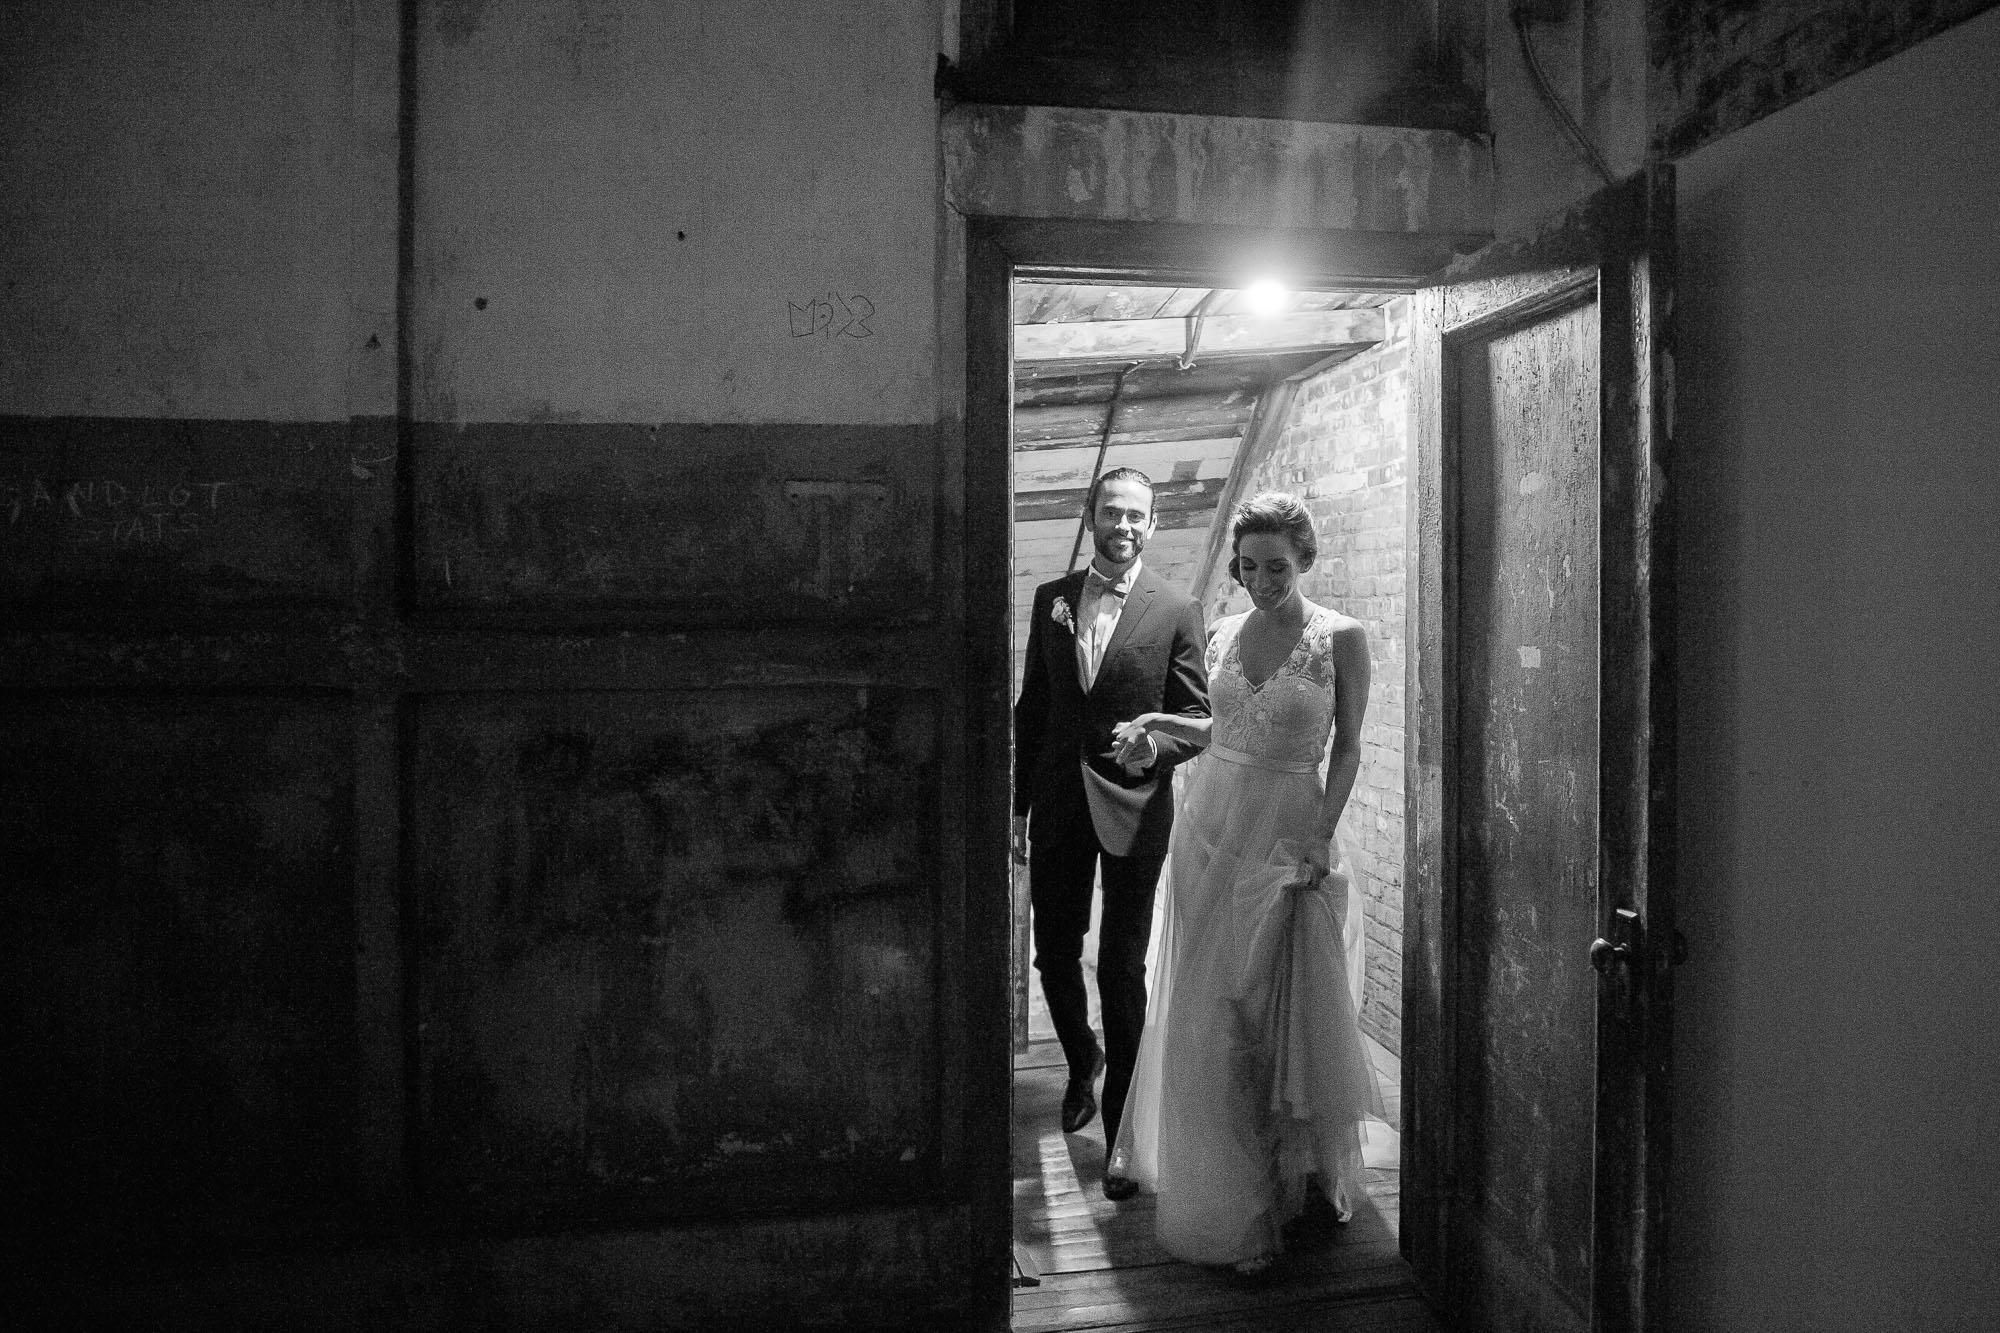 DSC_8678greenpoint-lofts-brooklyn-wedding-049.jpg